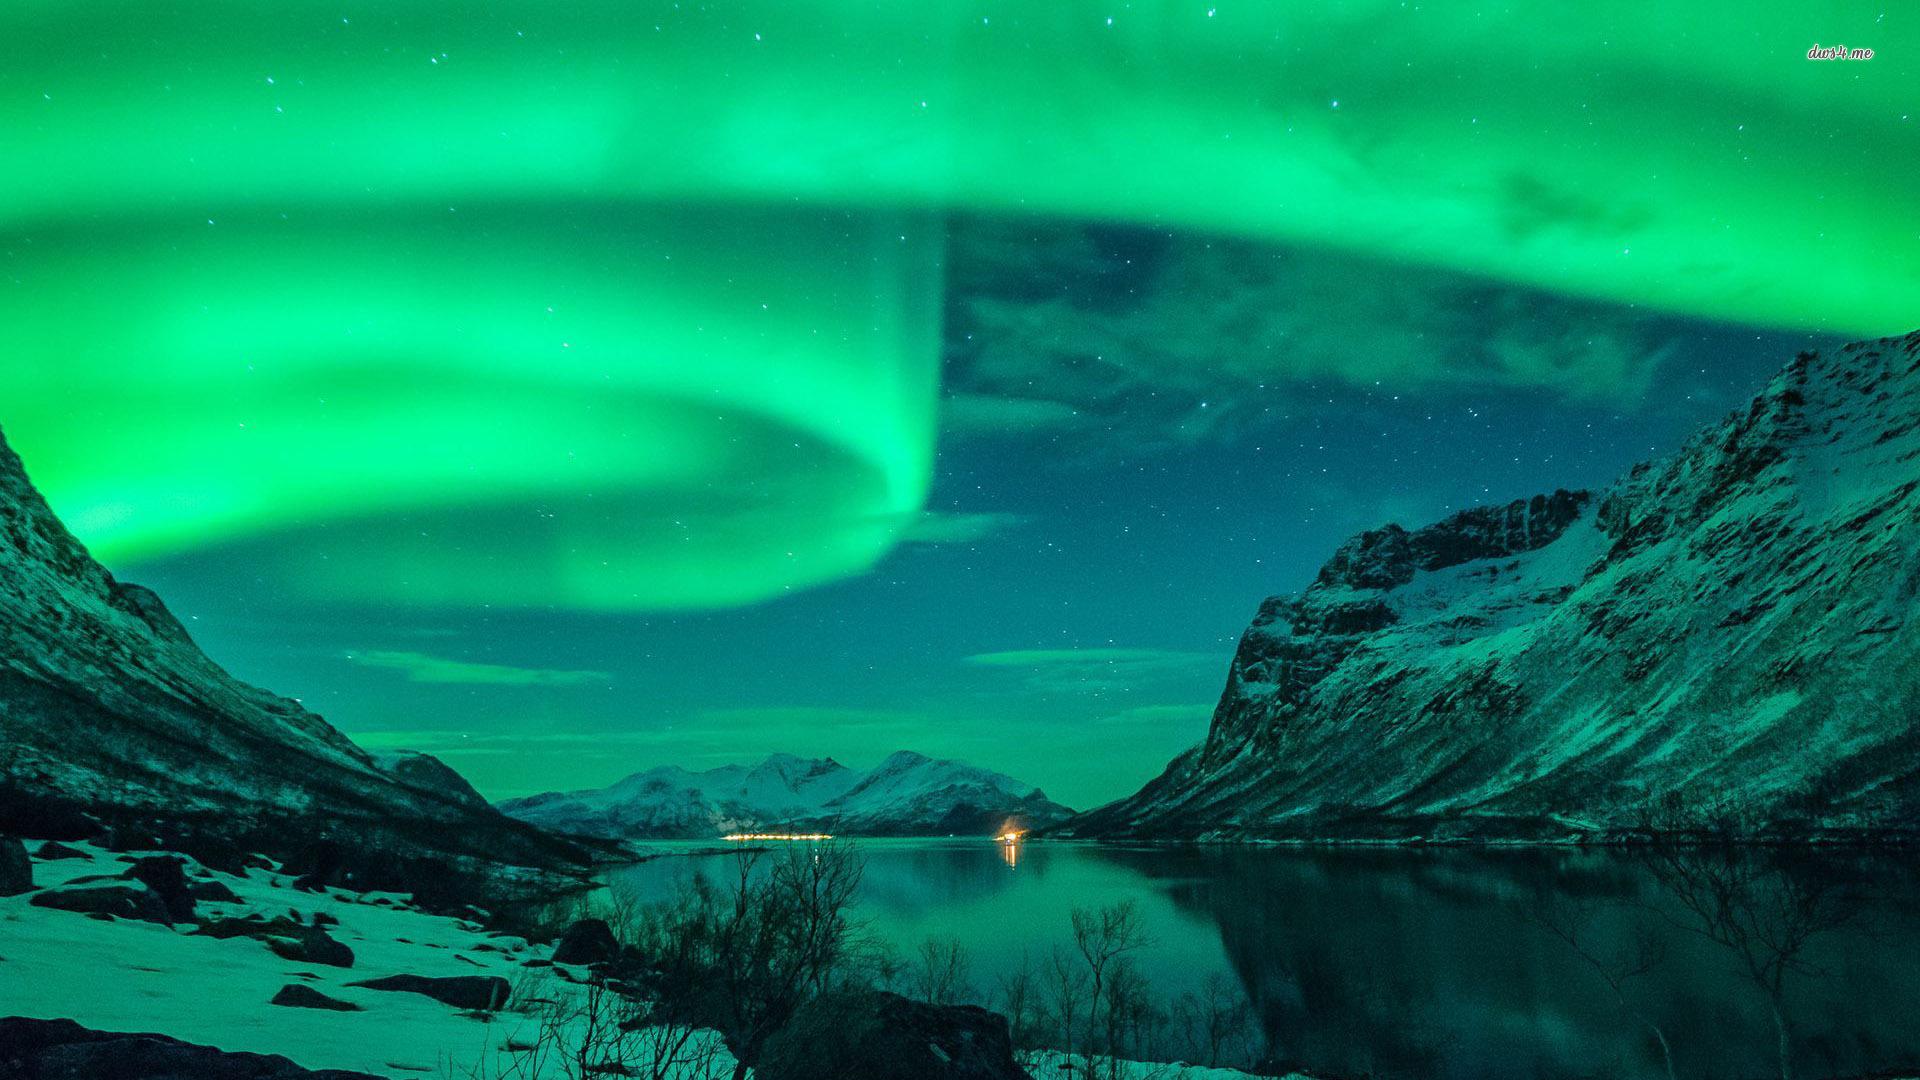 ... Breath taking Aurora Borealis wallpaper 1920x1080 ...